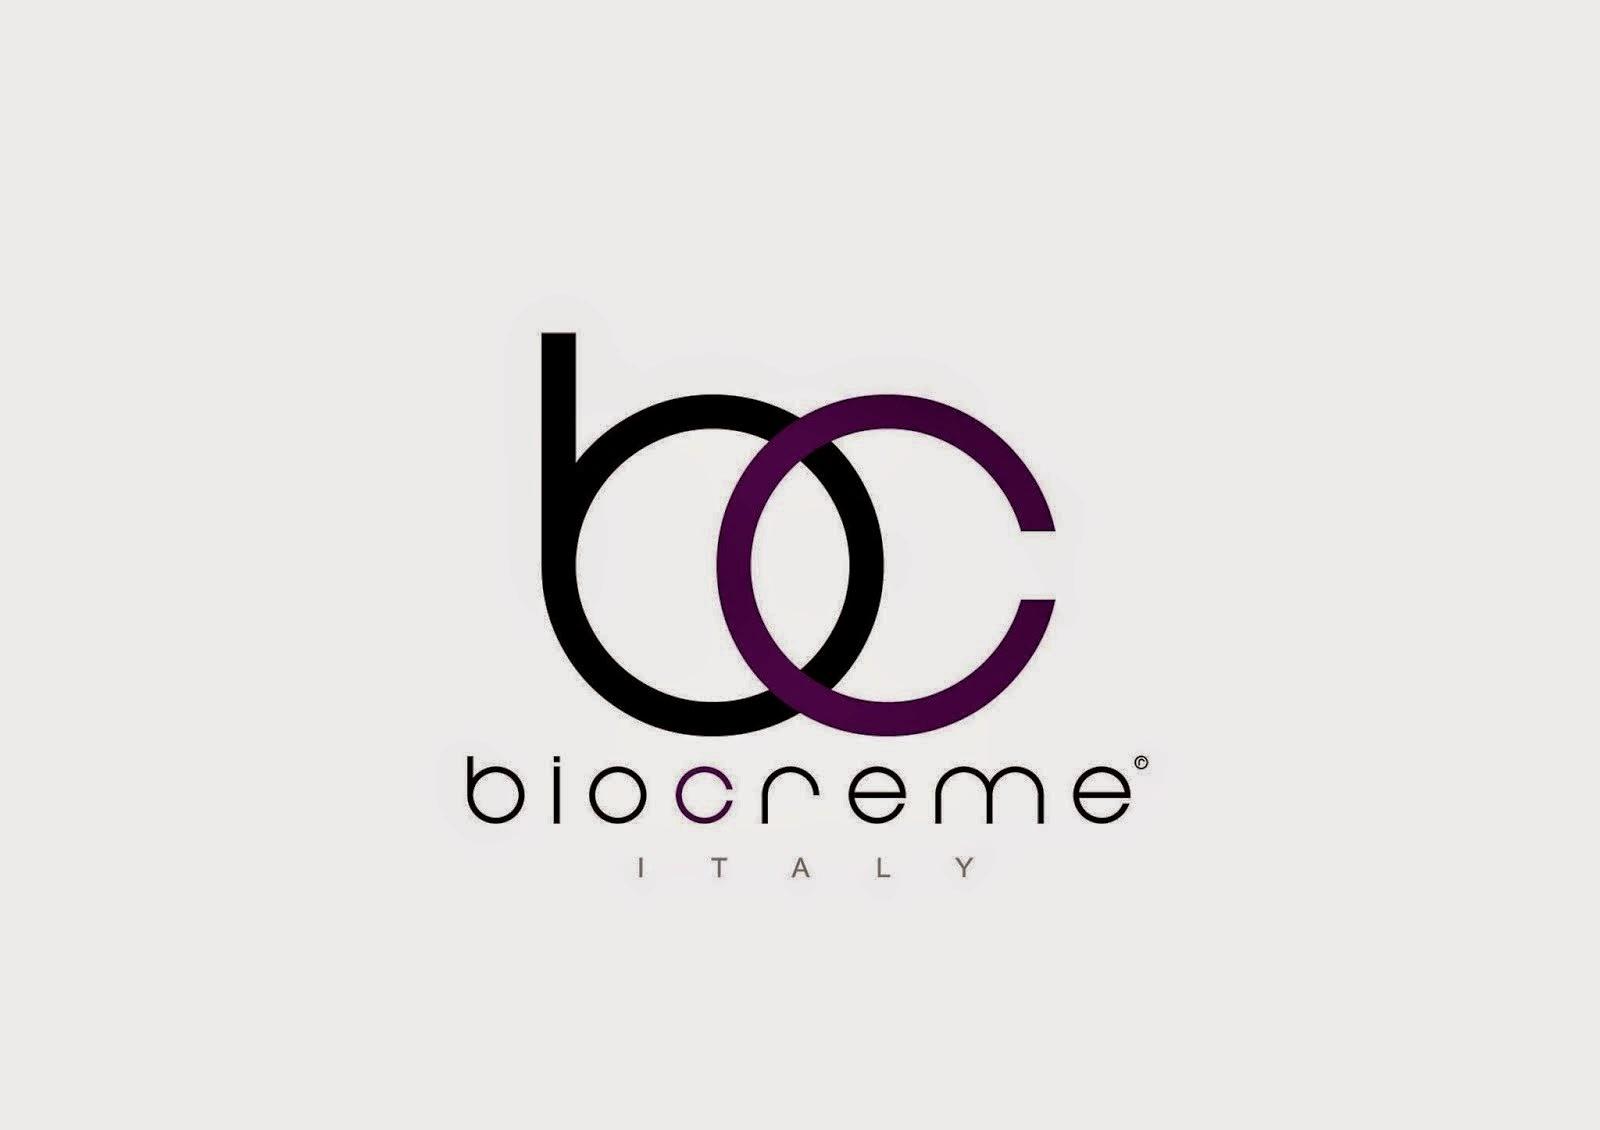 http://www.biocreme.it/it/